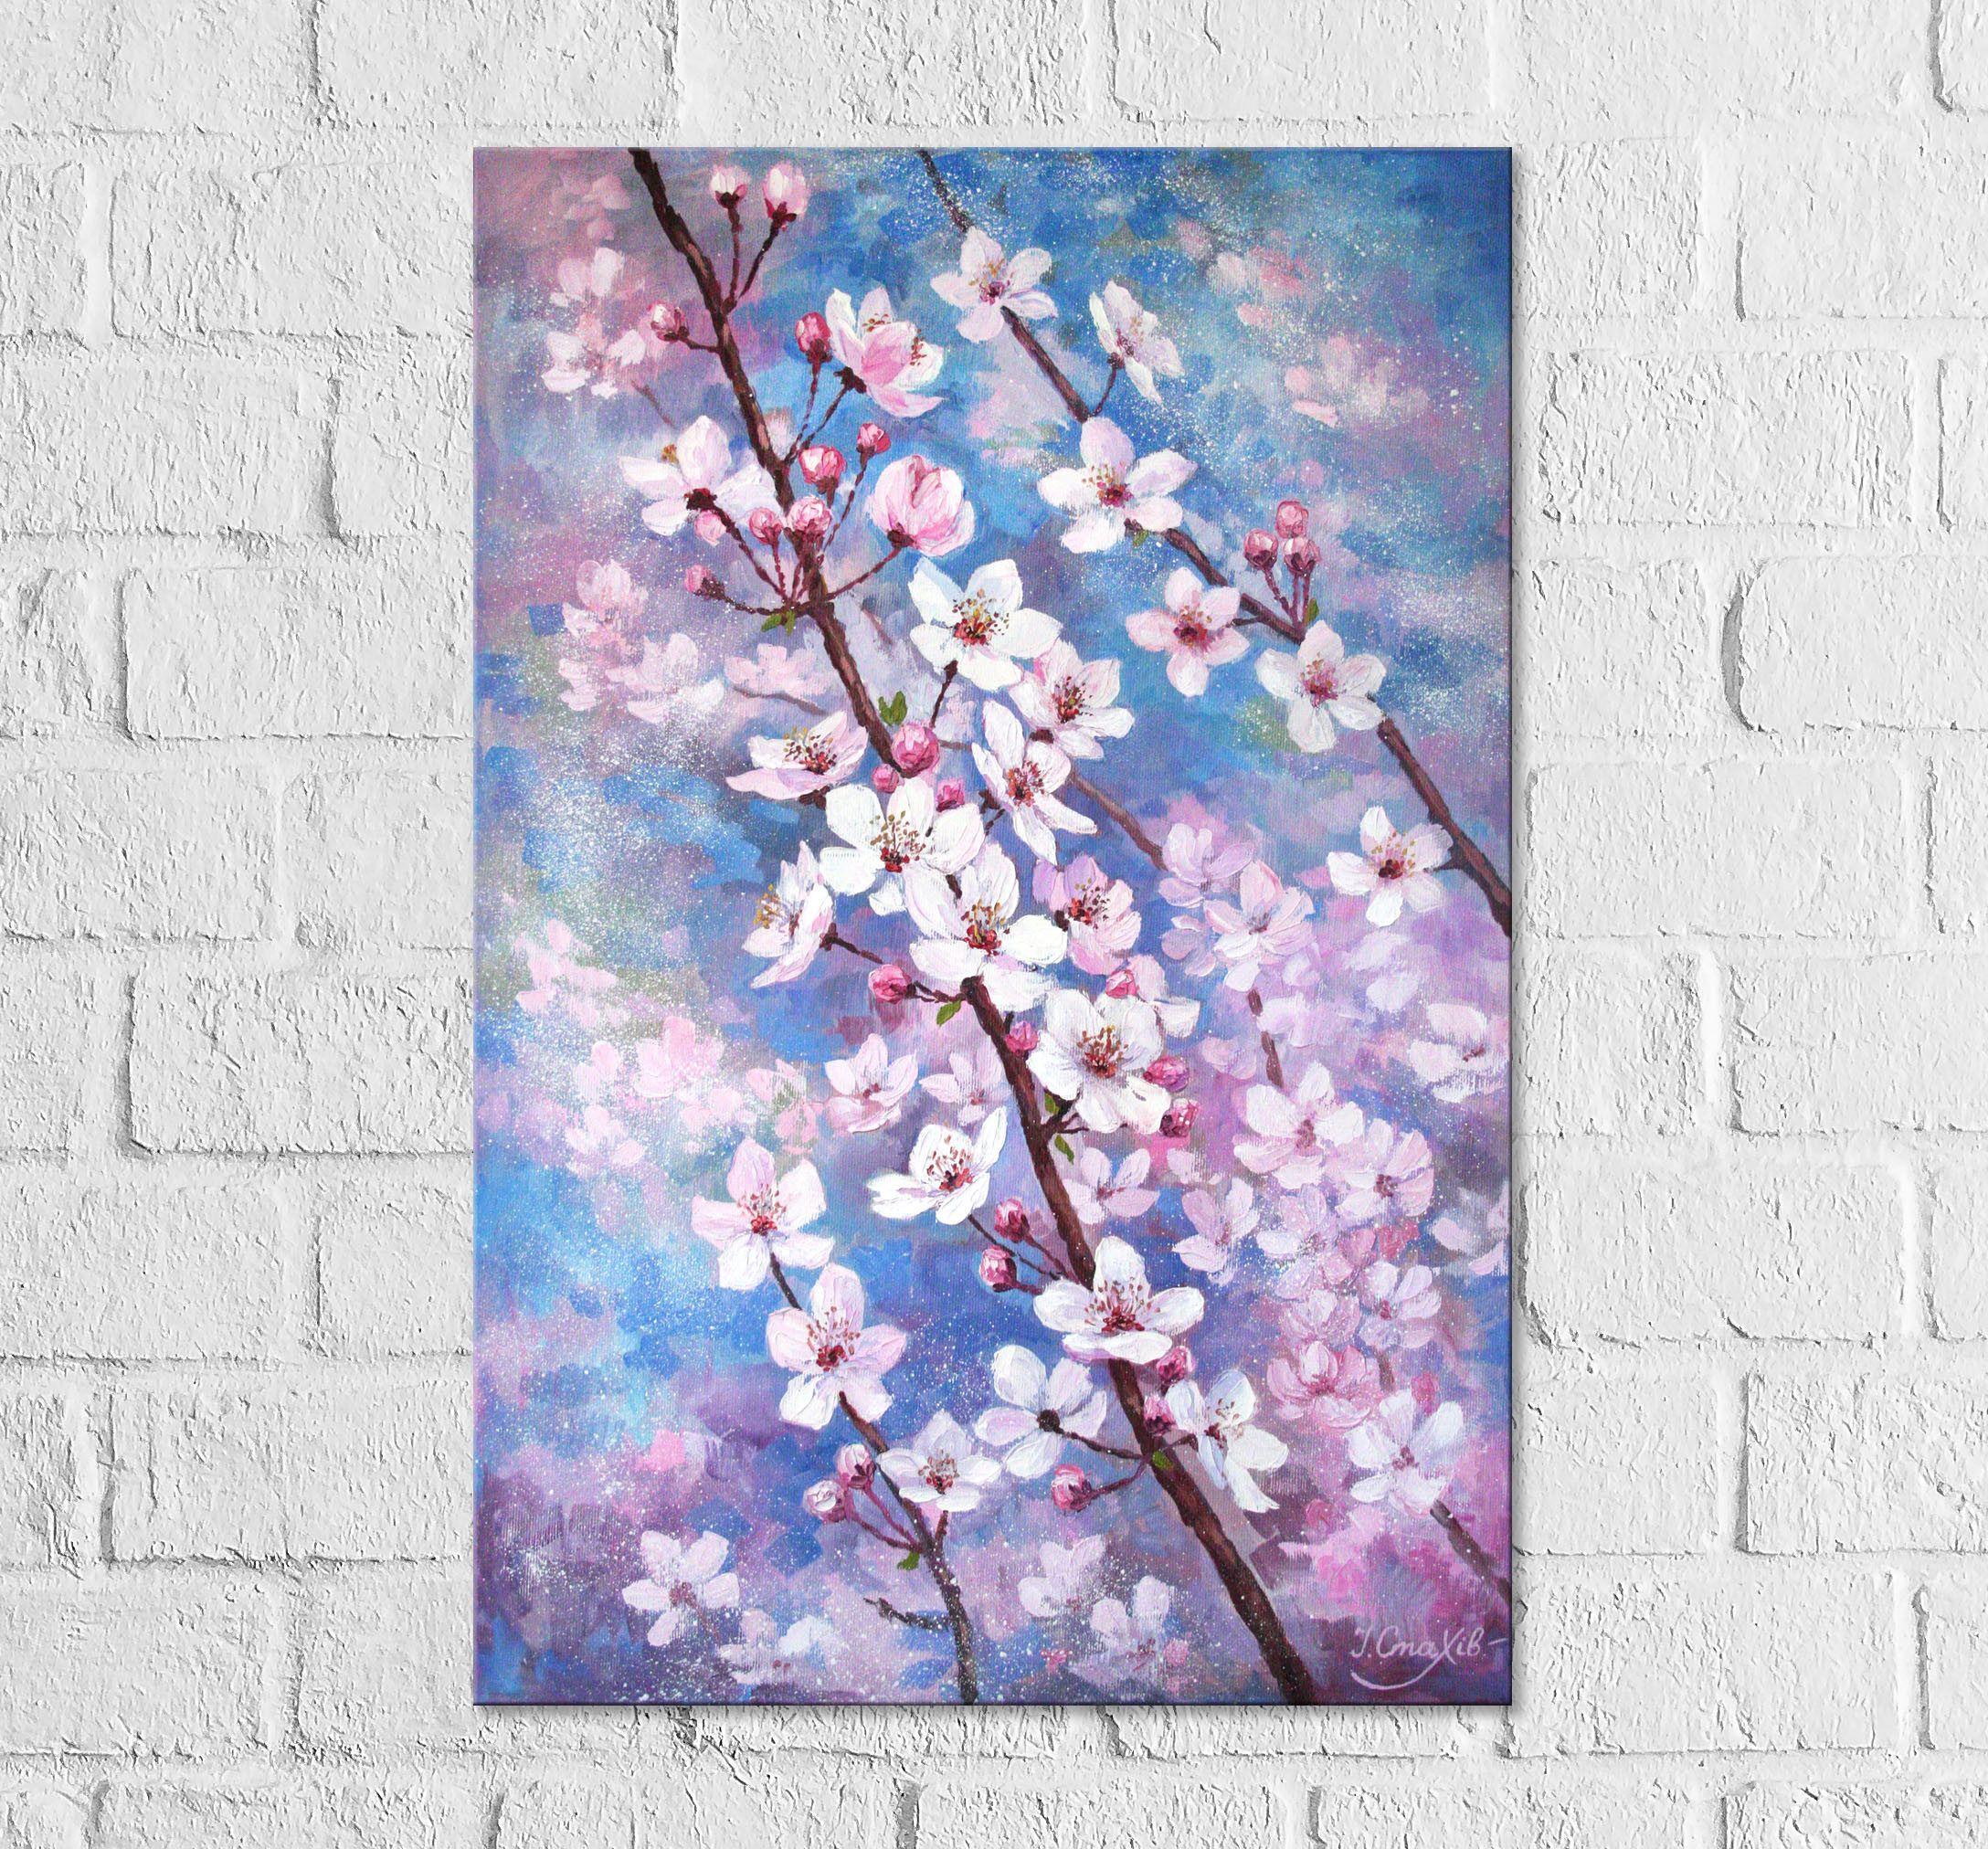 Pink Cherry Blossom Painting Vertical Canvas Art Flowering Cherry Tree Branch Original Wall Art Cherry Blossom Painting Floral Oil Paintings Cherry Blossom Art